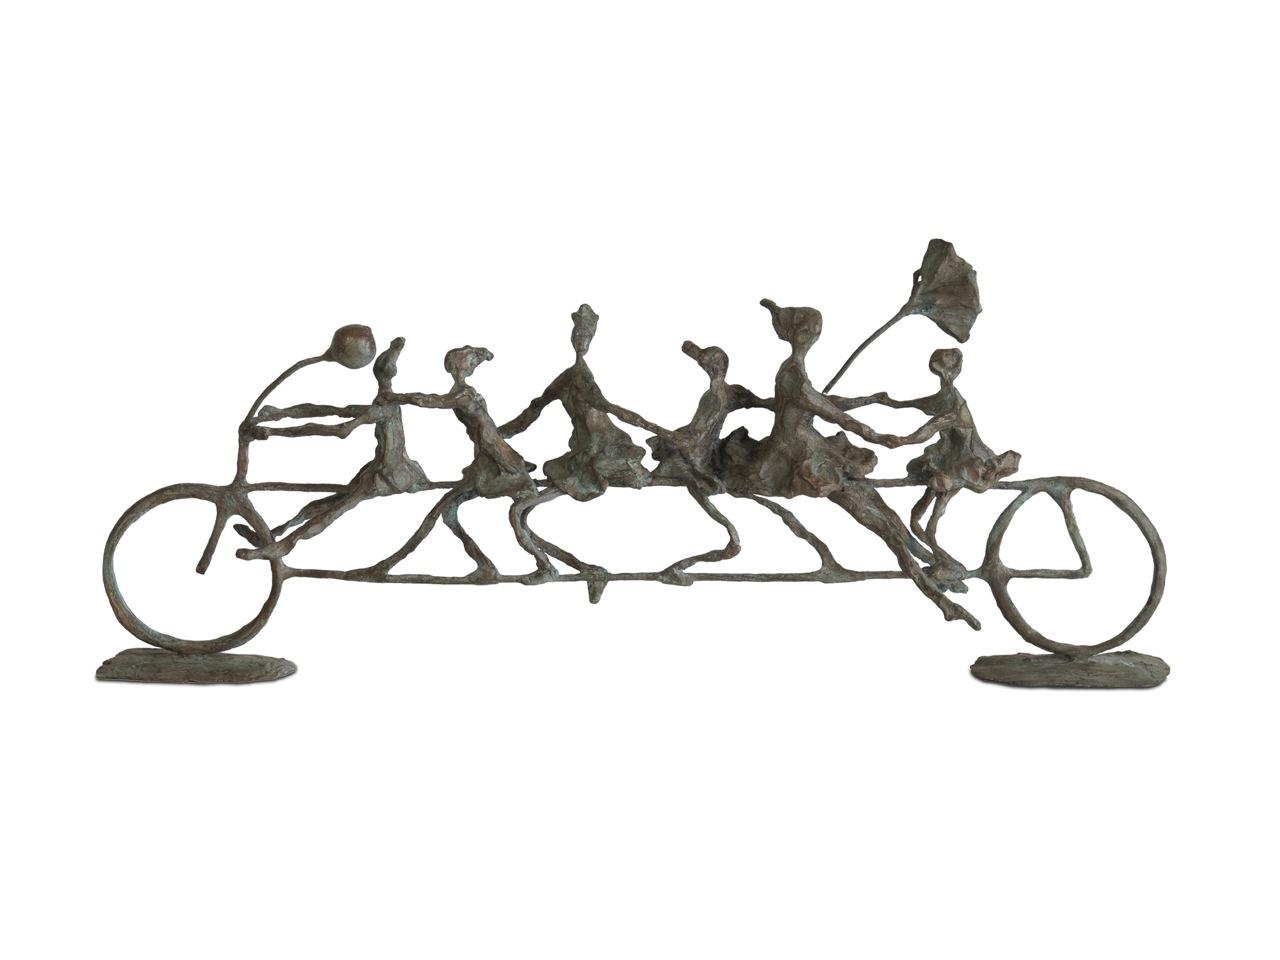 'Transported' - Astrid Huisman-Biemans